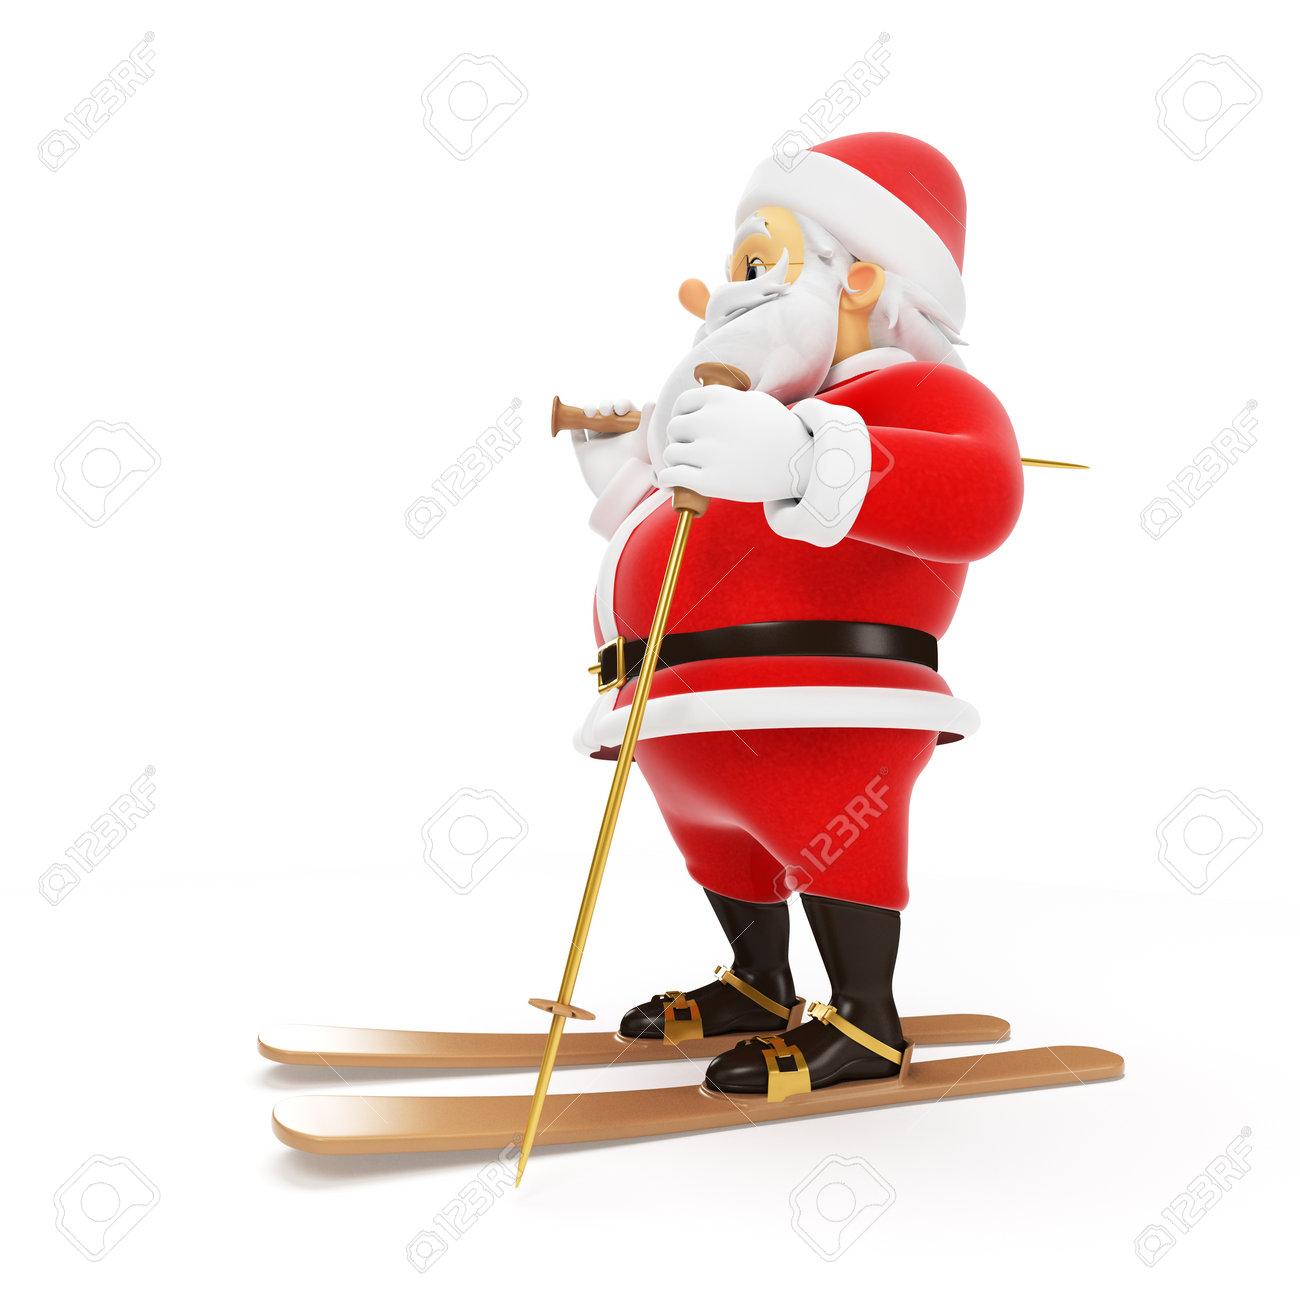 3d rendered illustration of a little santa skiing Stock Photo - 17426905